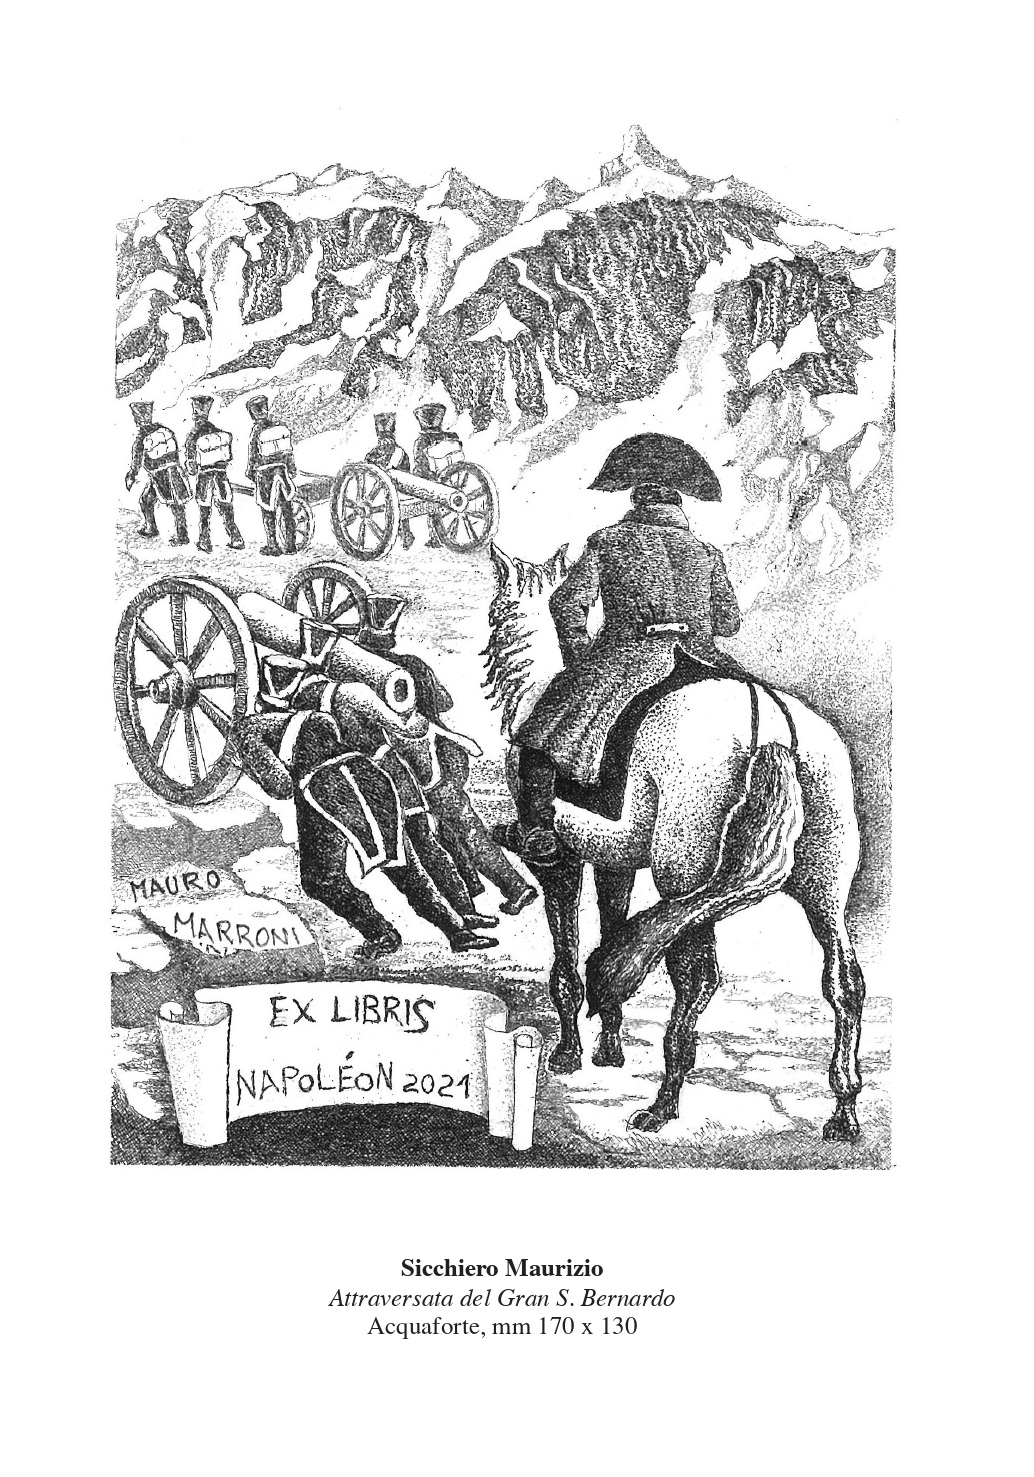 CATALOGO exlibris 2021-139_page-0001